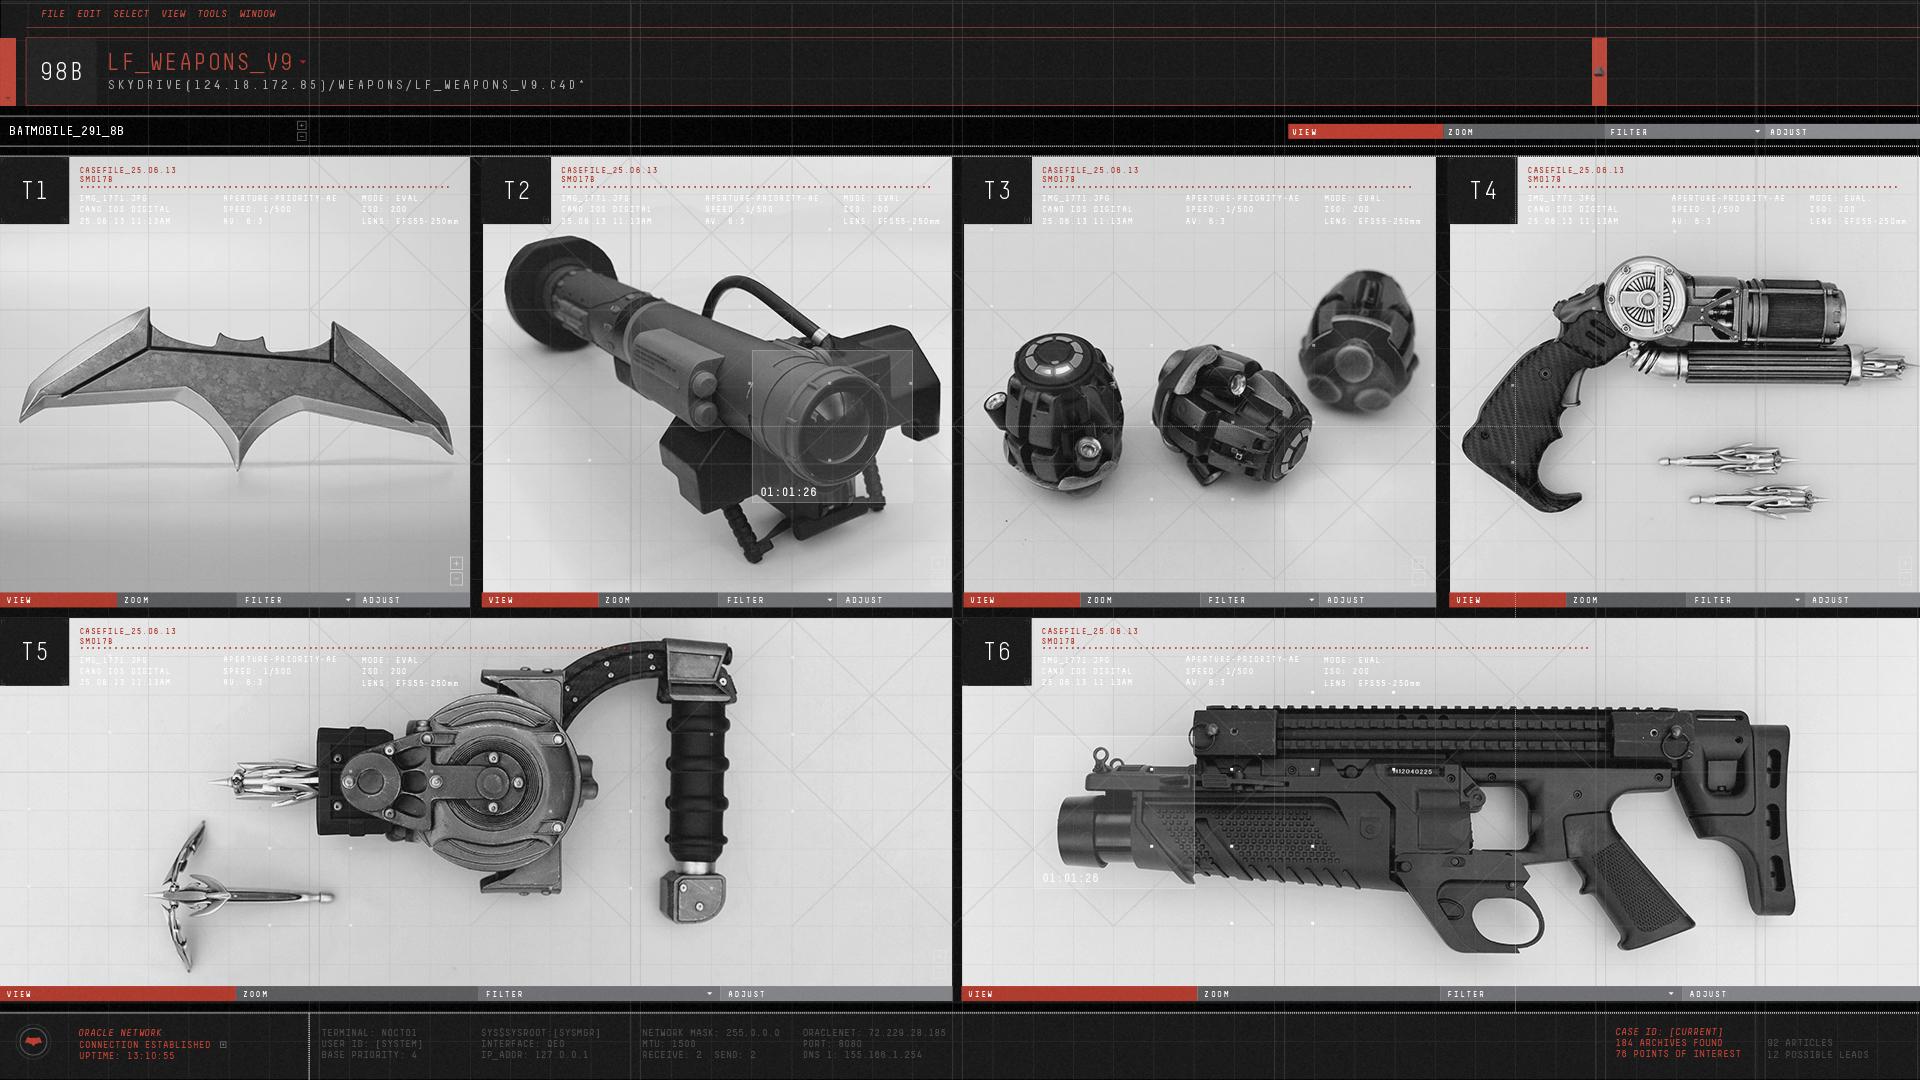 BatcaveOS_Weapons_2_001.jpg